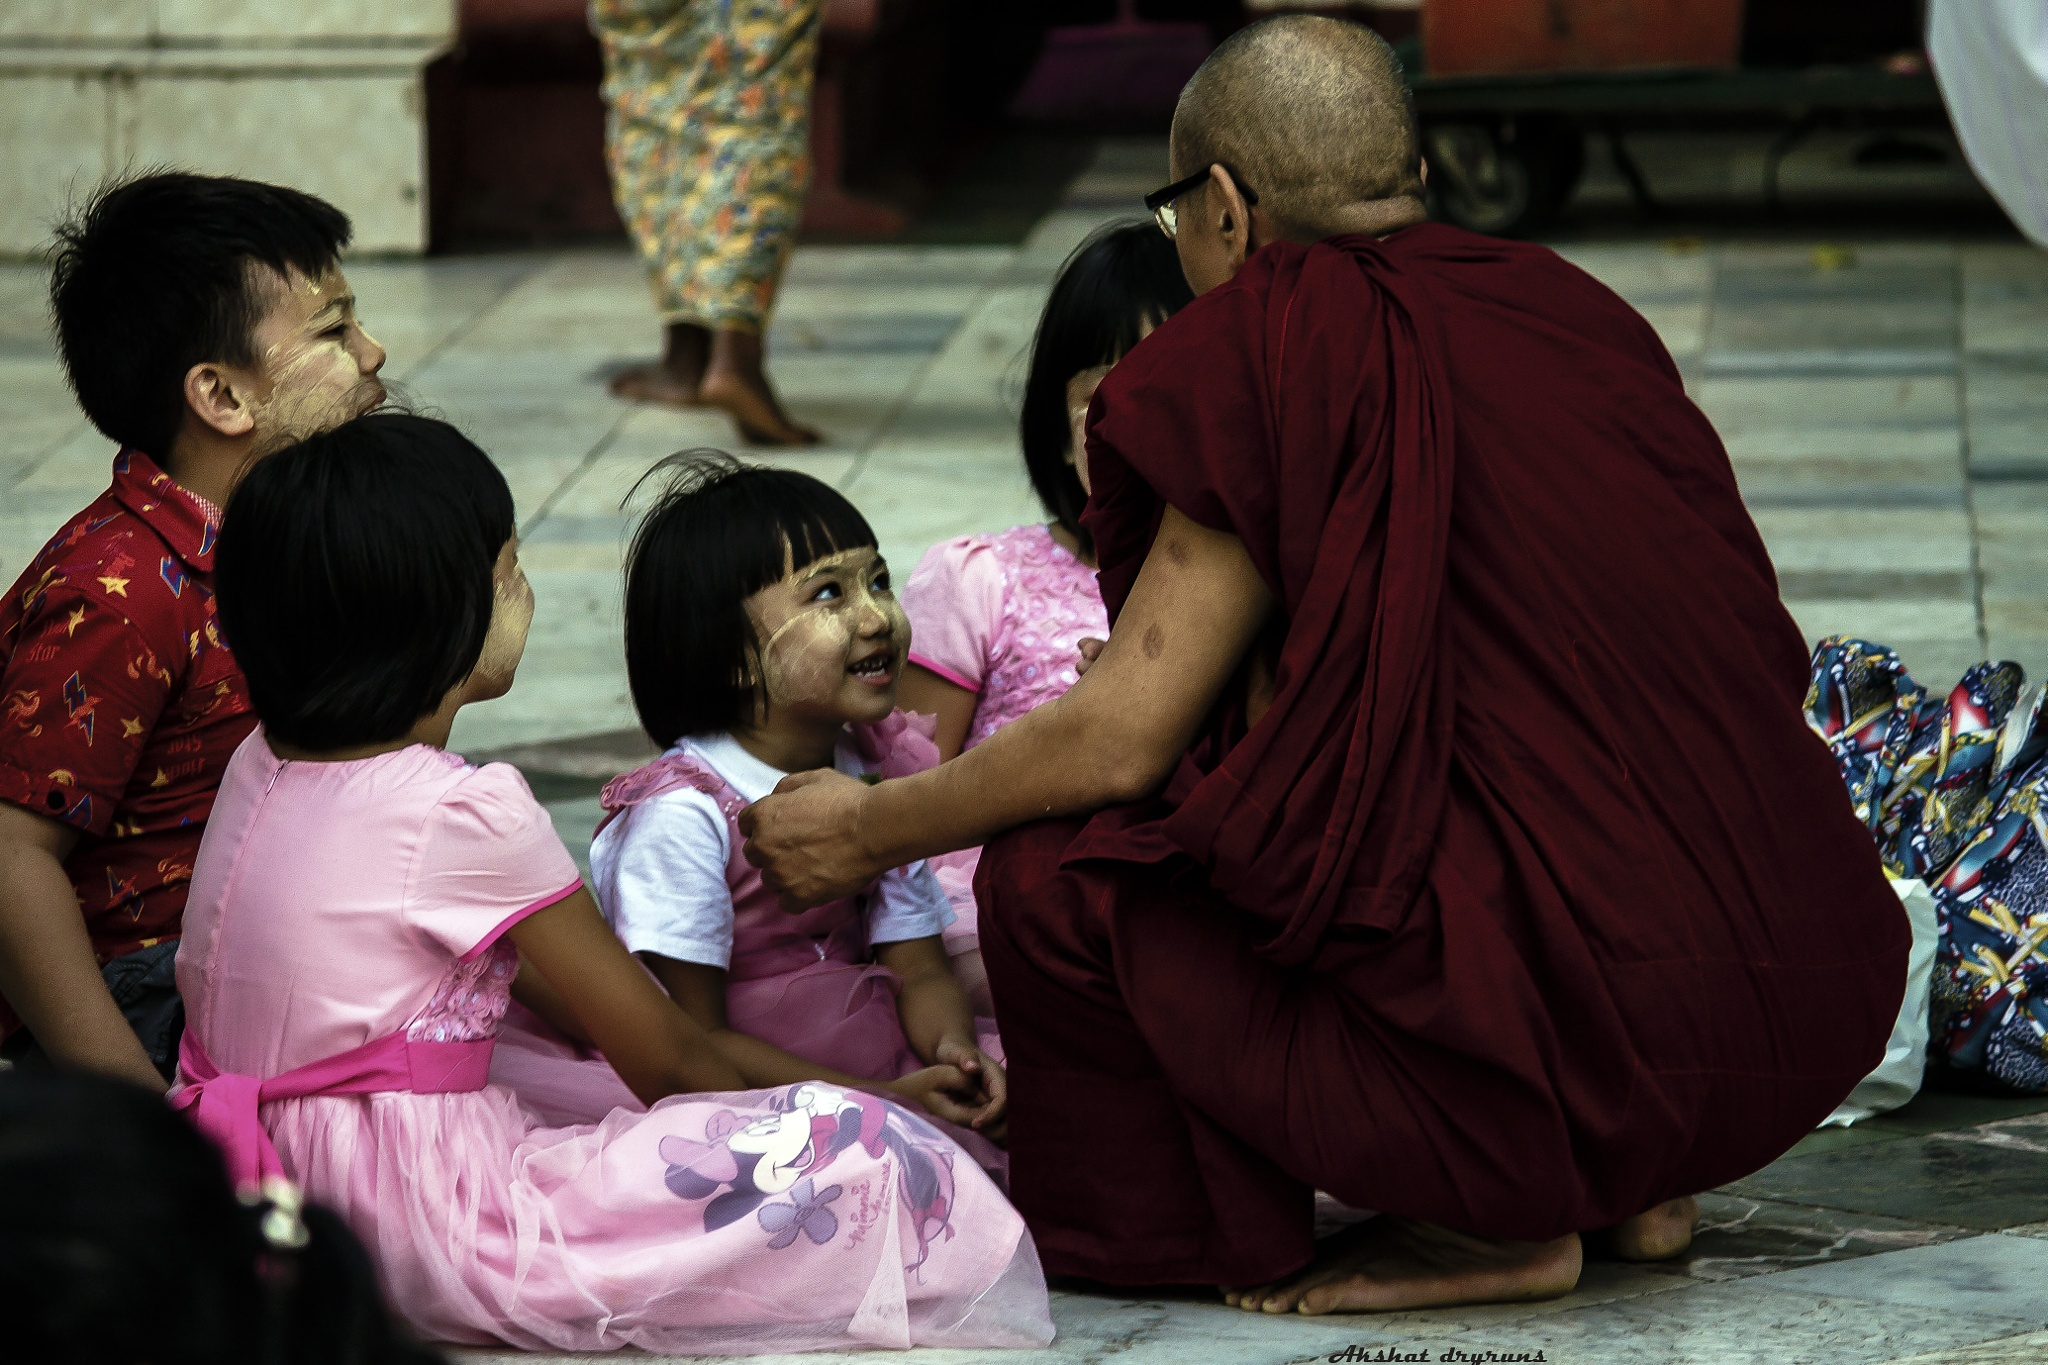 Life Inside Pagoda - Teacher by Akshat dryruns